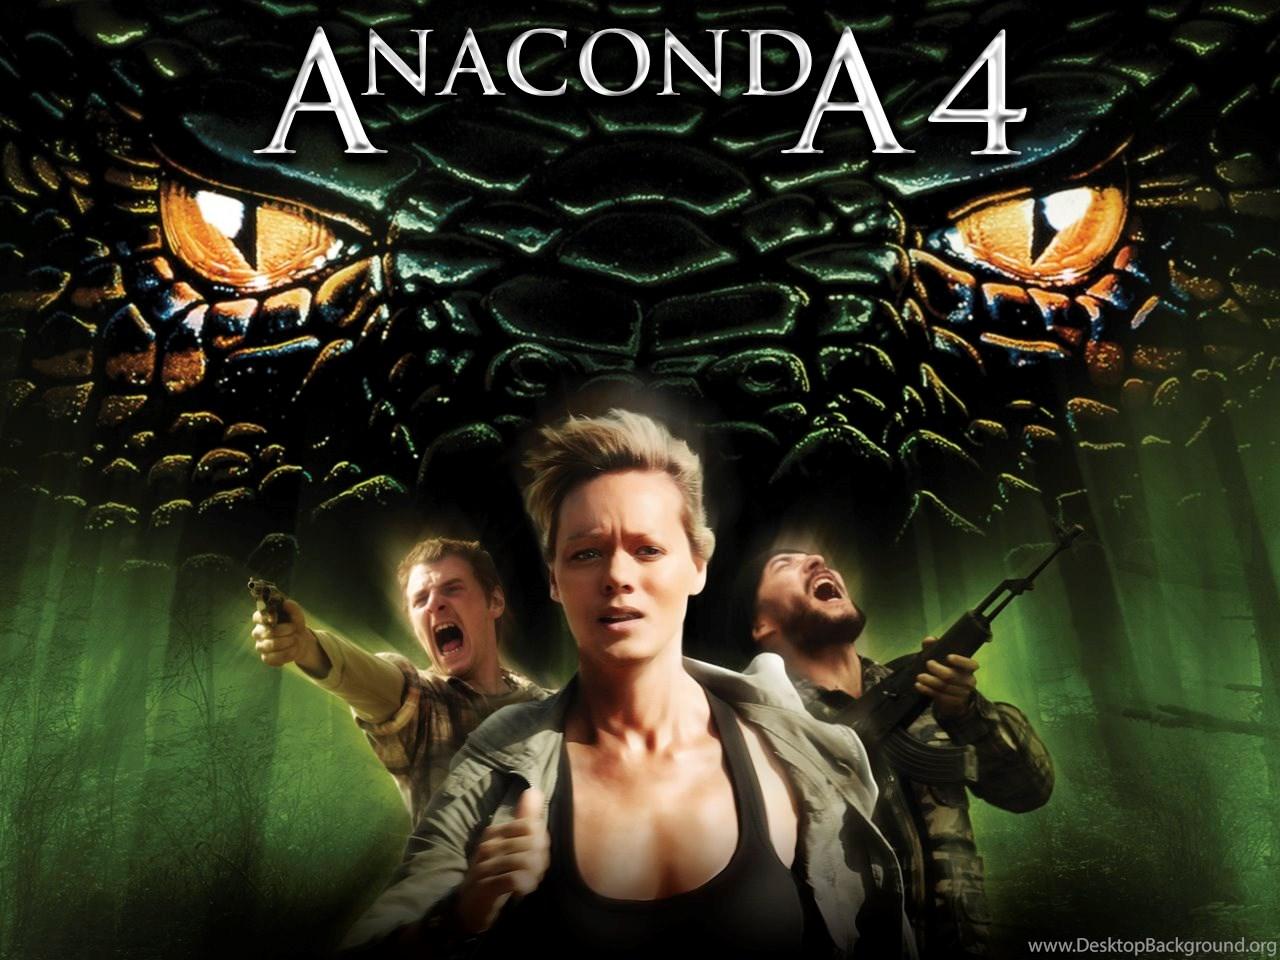 anaconda 3 full movie in hindi watch online free